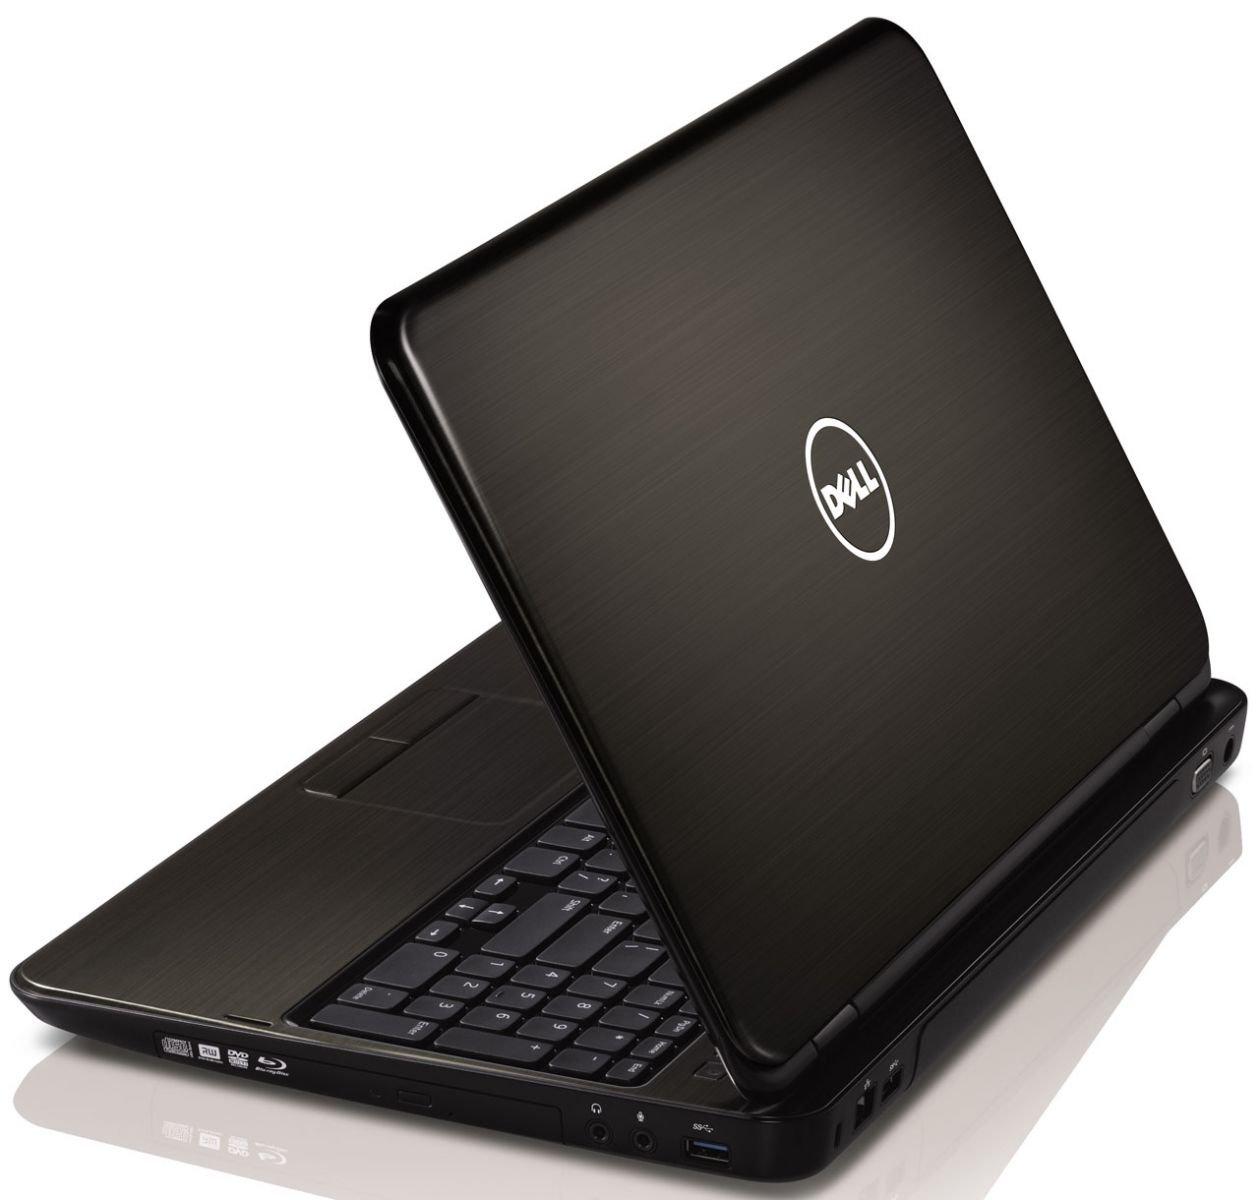 Dell-Inspiron-15R-N5110-Intel-Core-i5-2430M-2-4GHz-6GB-640GB-DVD-RW-15-6-Win7-Black-